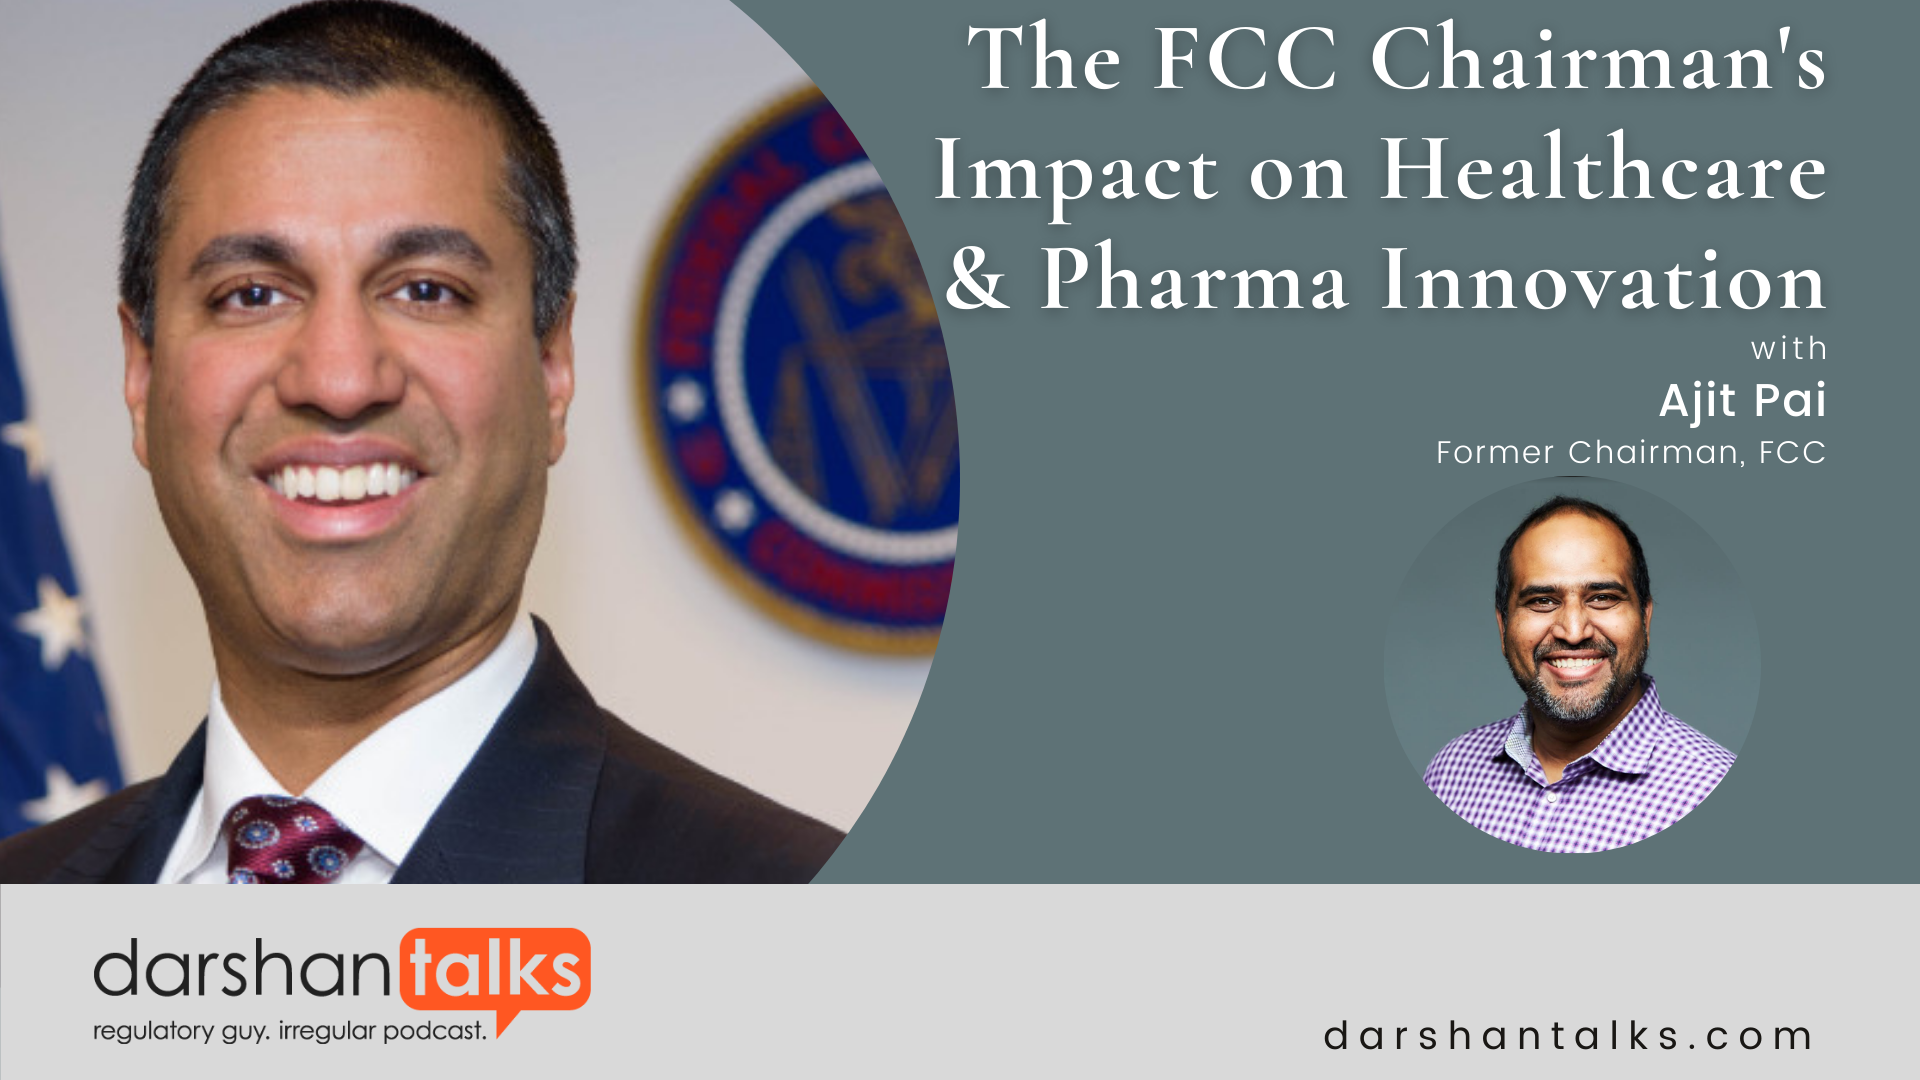 The FCC Chairman's Impact on Healthcare and Pharma Innovation